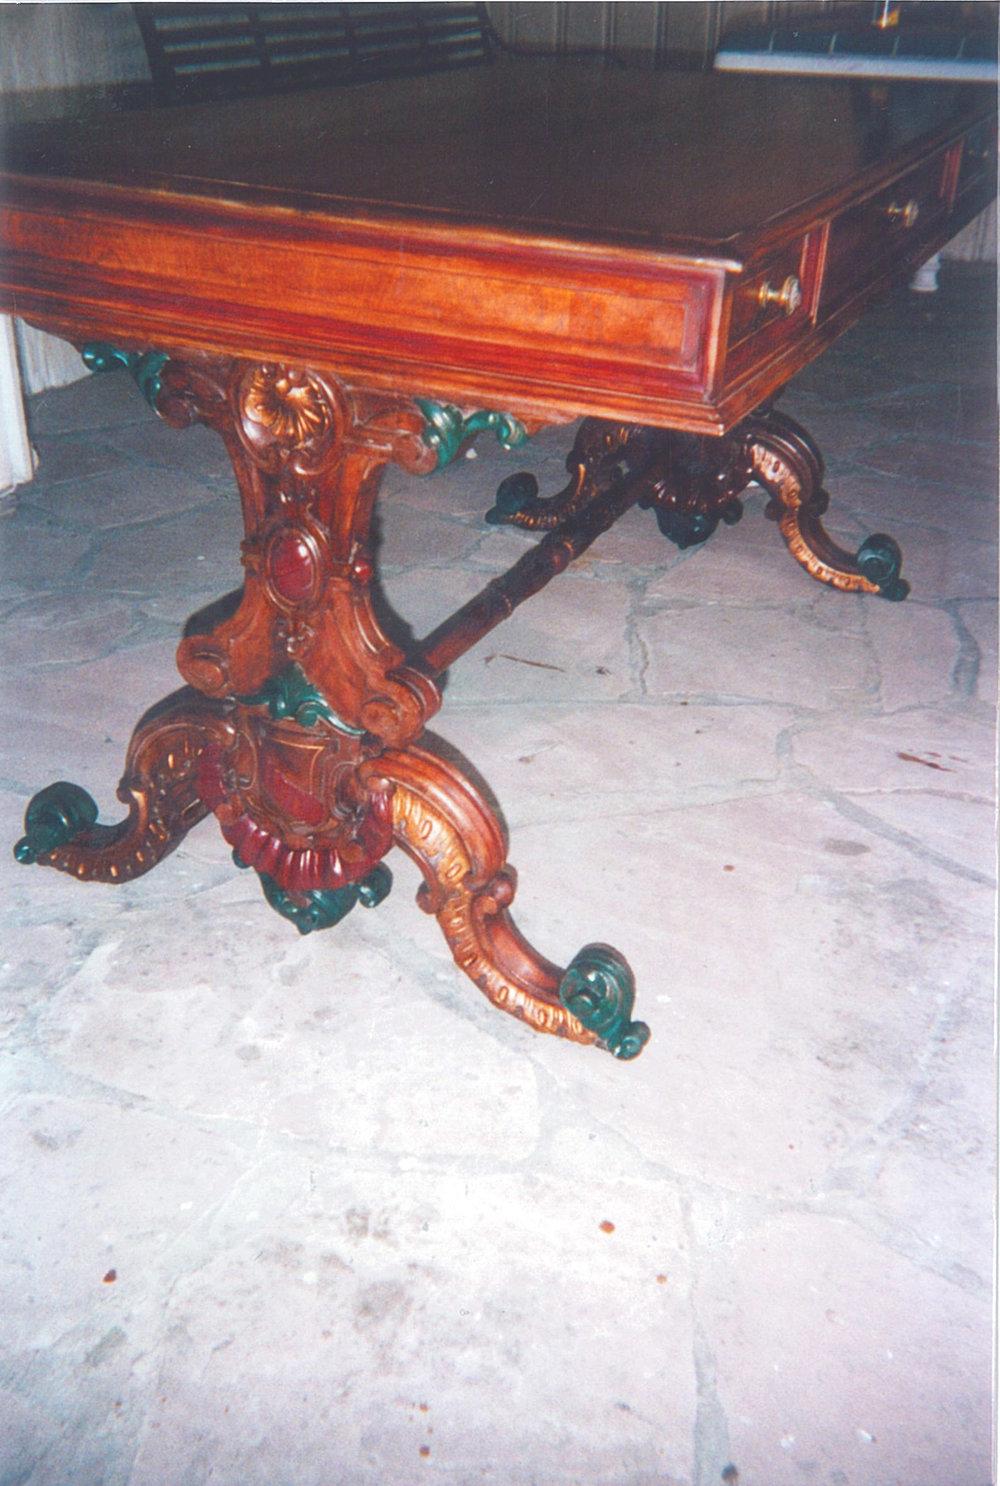 Spanish_Revival_Table-1.jpg